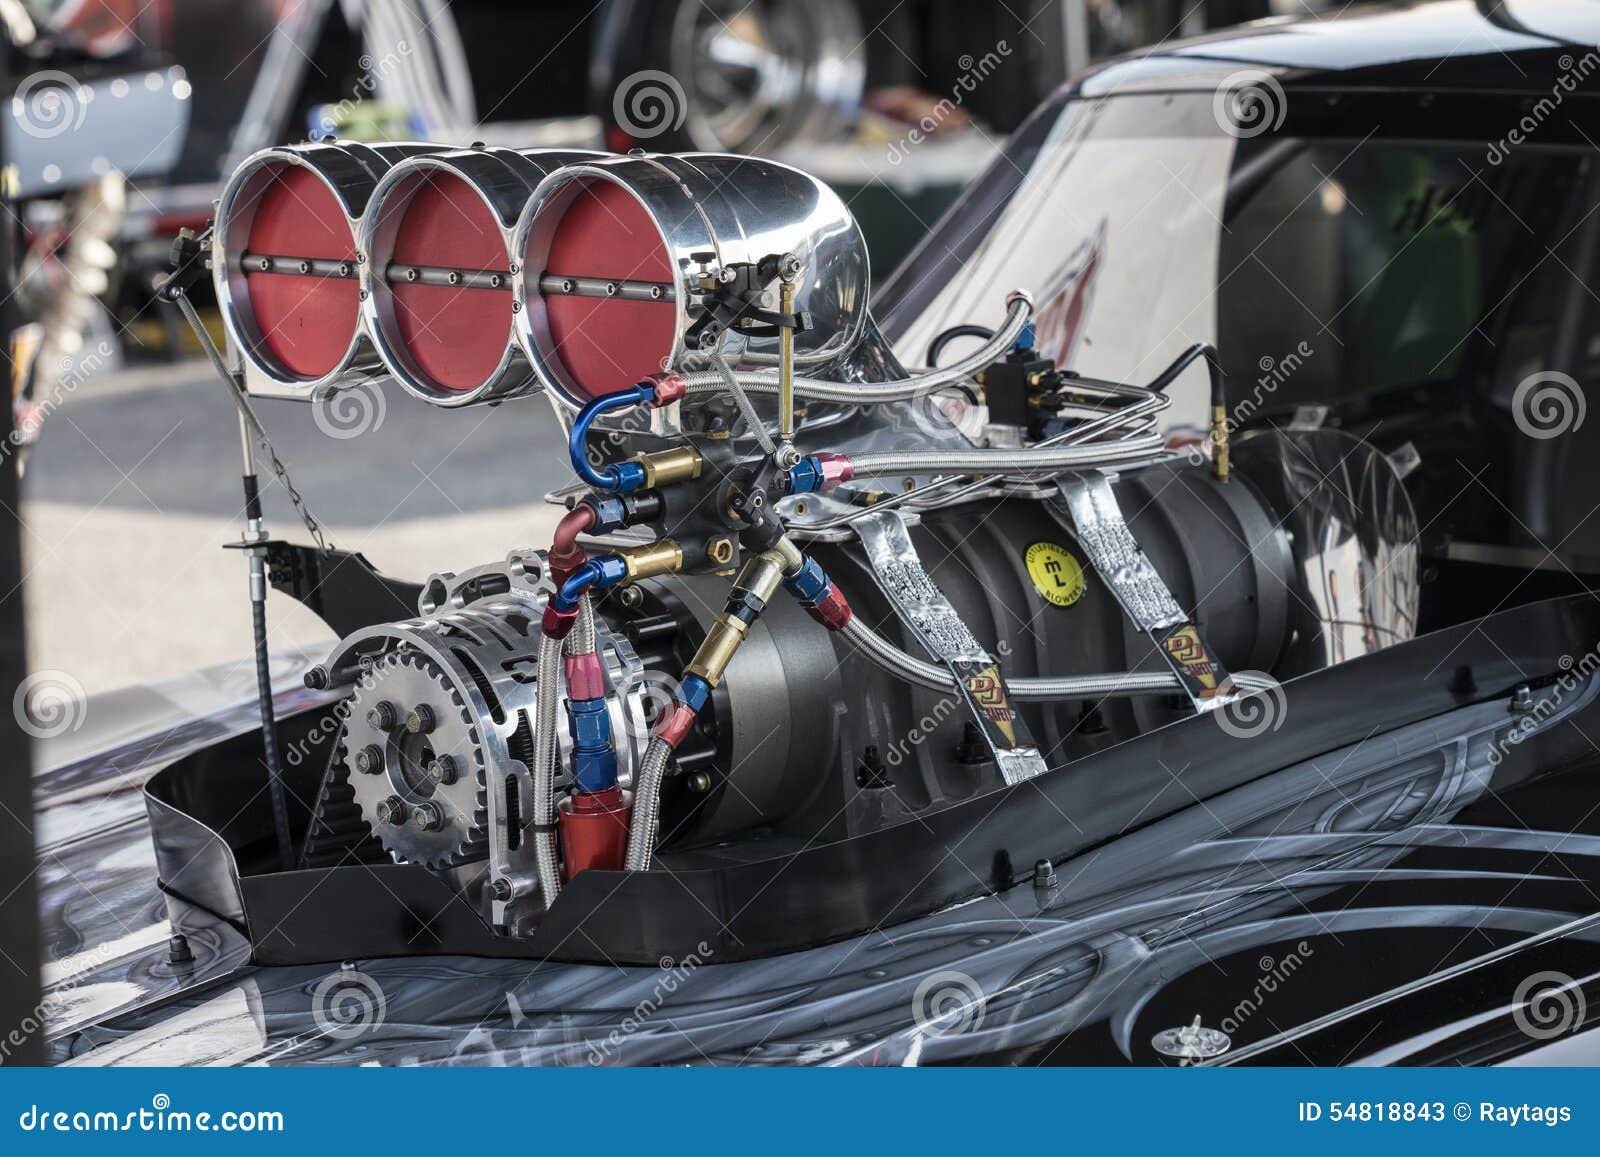 Car Engine Blower : Drag car engine editorial stock photo image